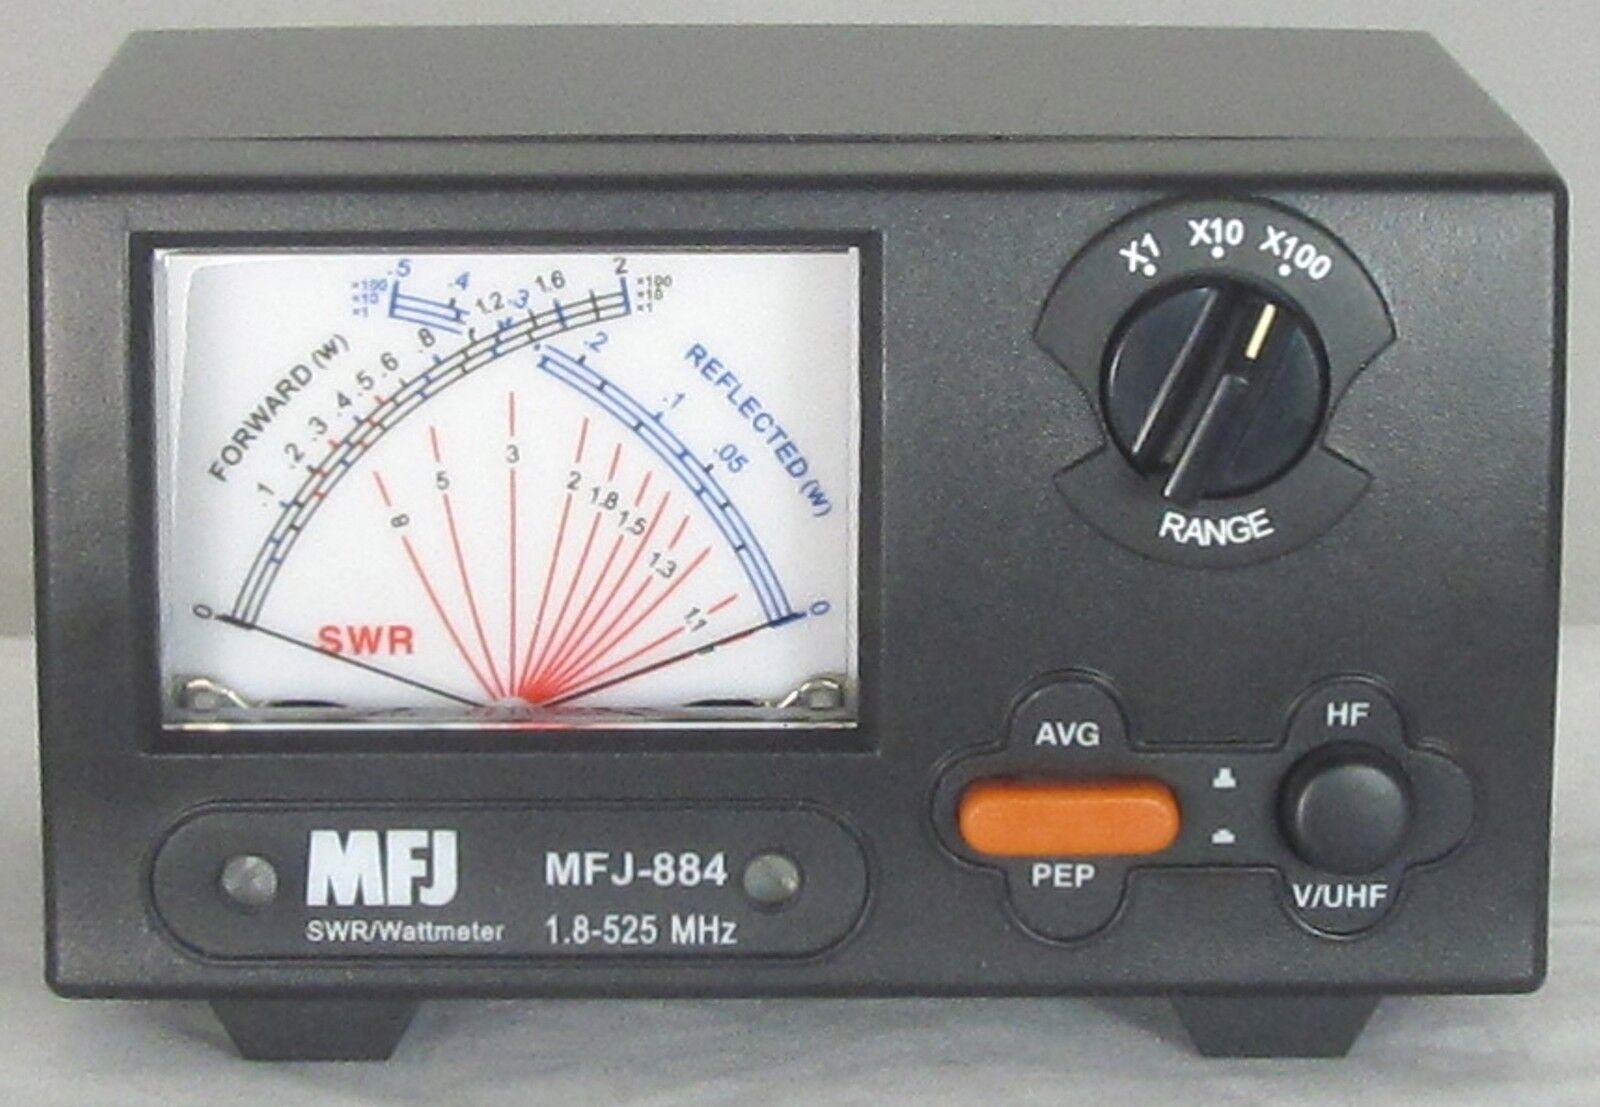 MFJ-884 1.8-525 MHz - 200 W - X SWR/Wattmeter. Available Now for 144.95